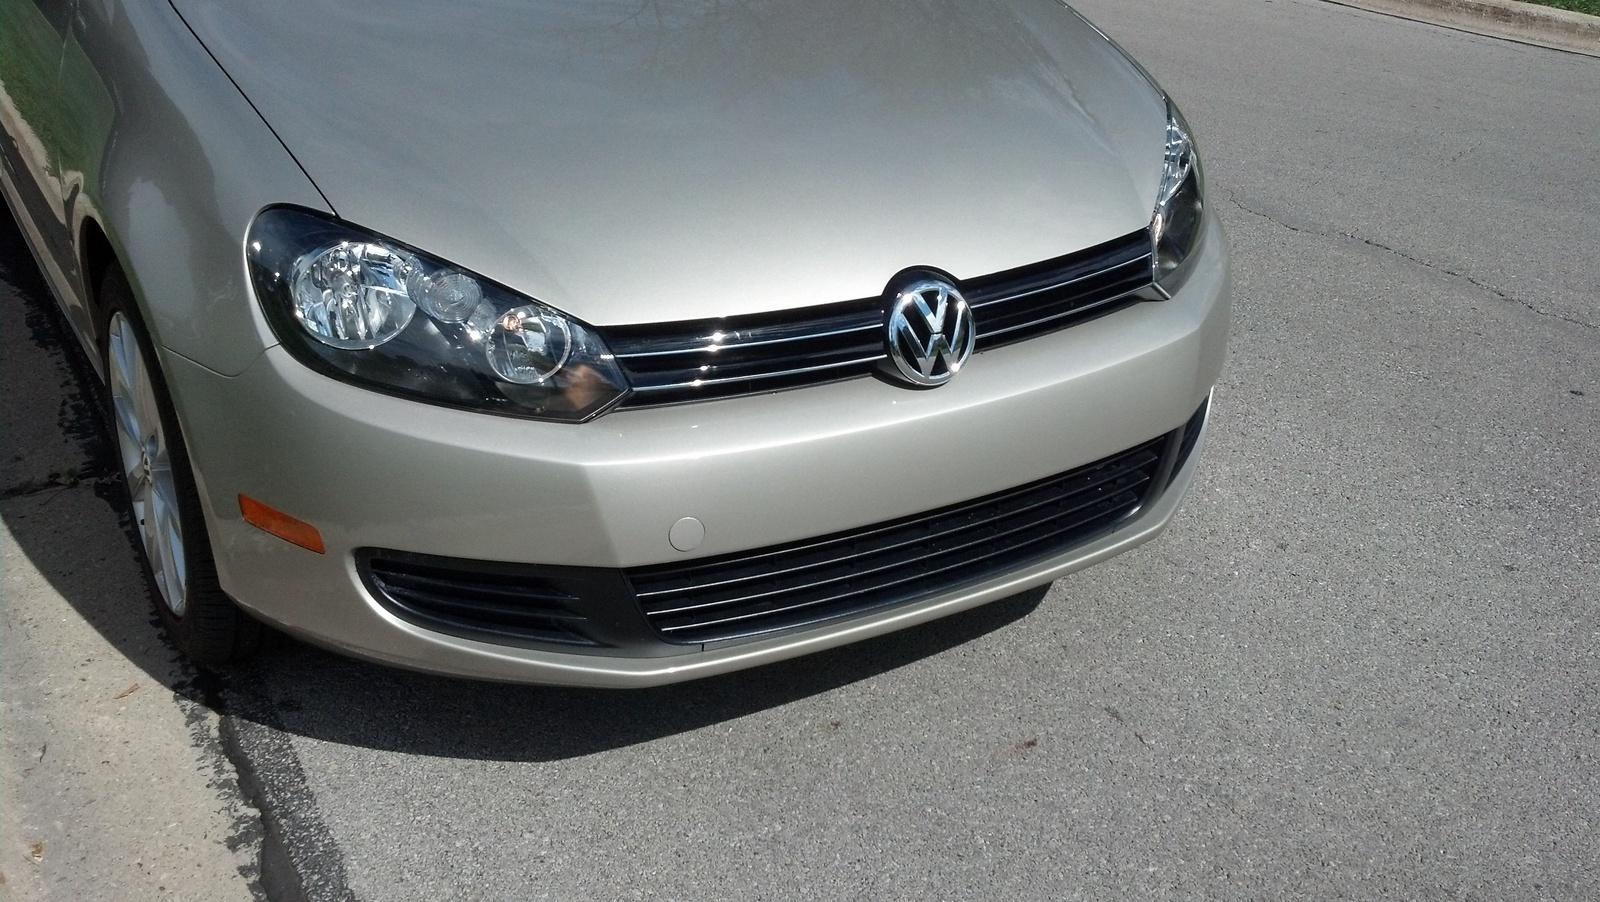 Picture of 2014 Volkswagen Jetta SportWagen TDI w/ Sunroof